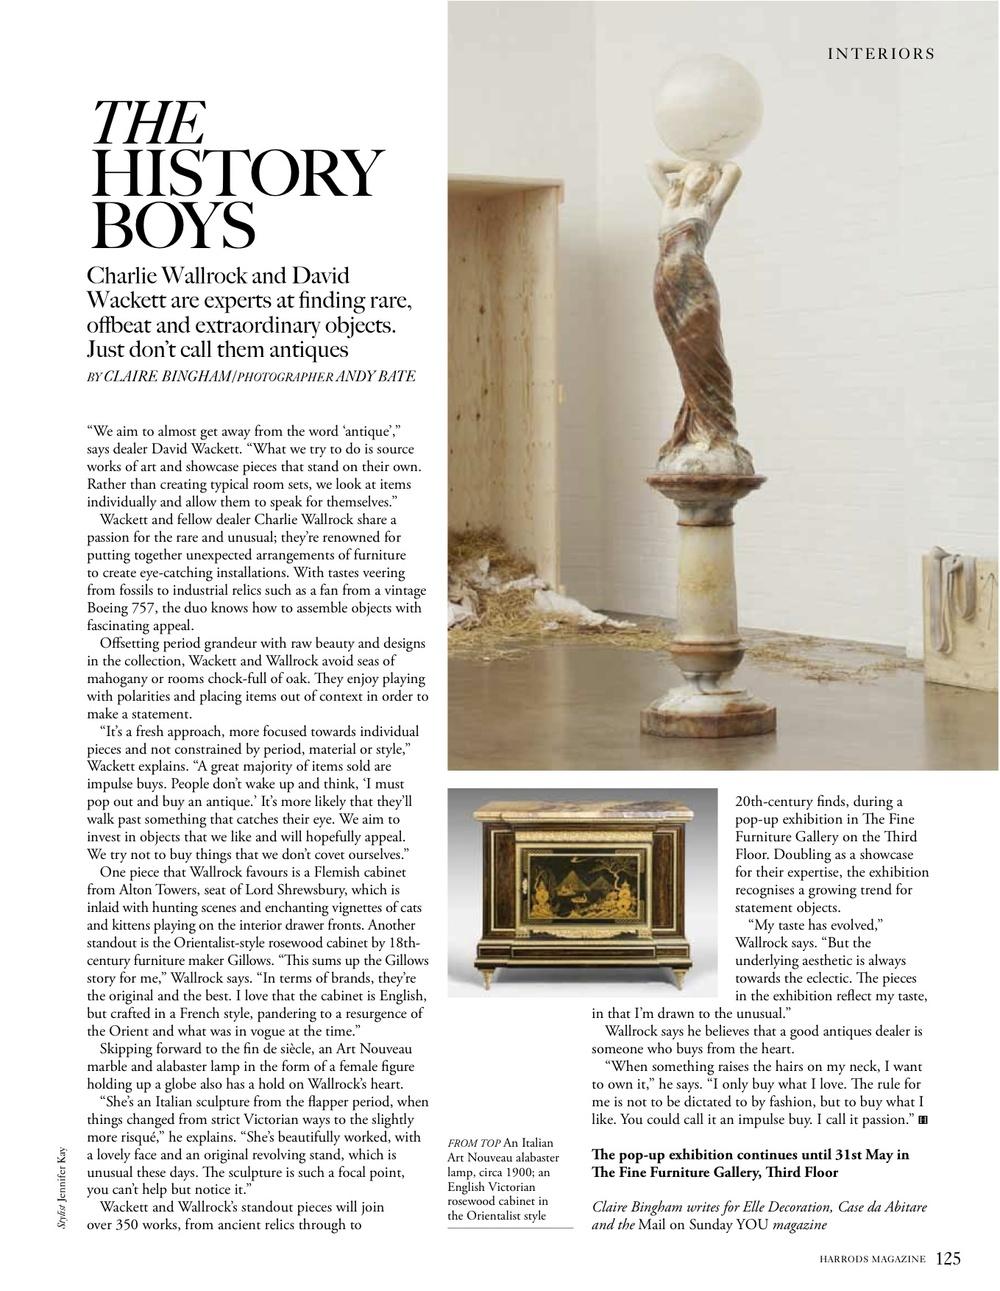 Harrods magazine, April 2014